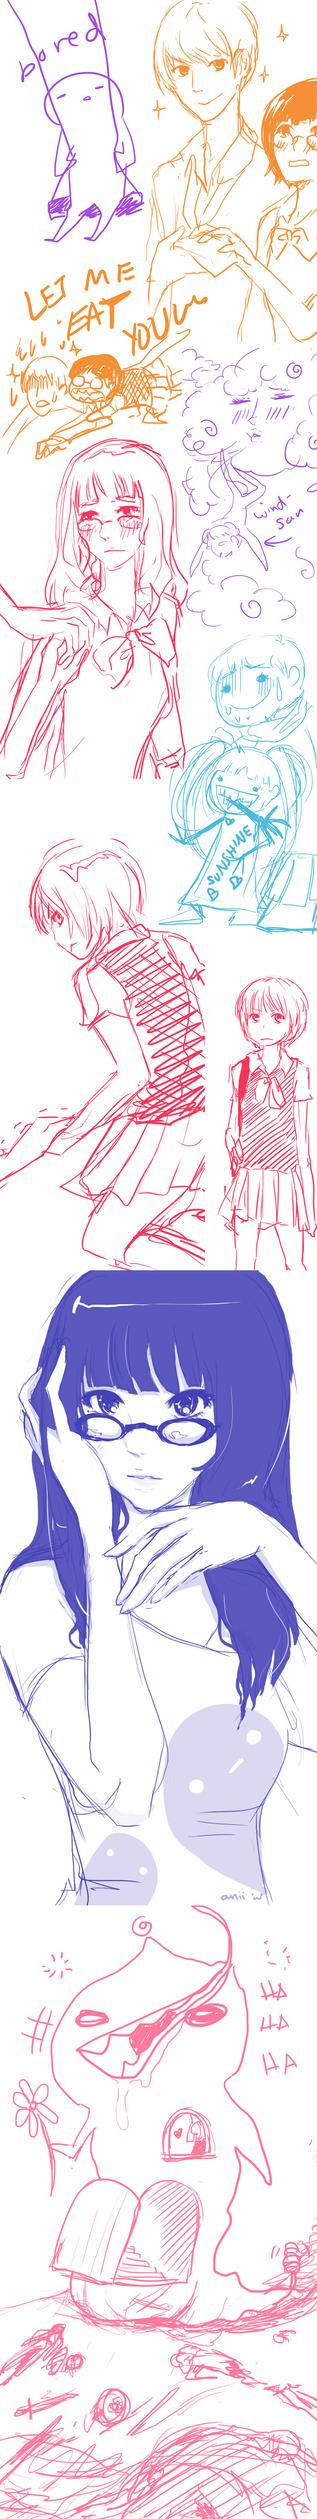 Art Dump by animezirow